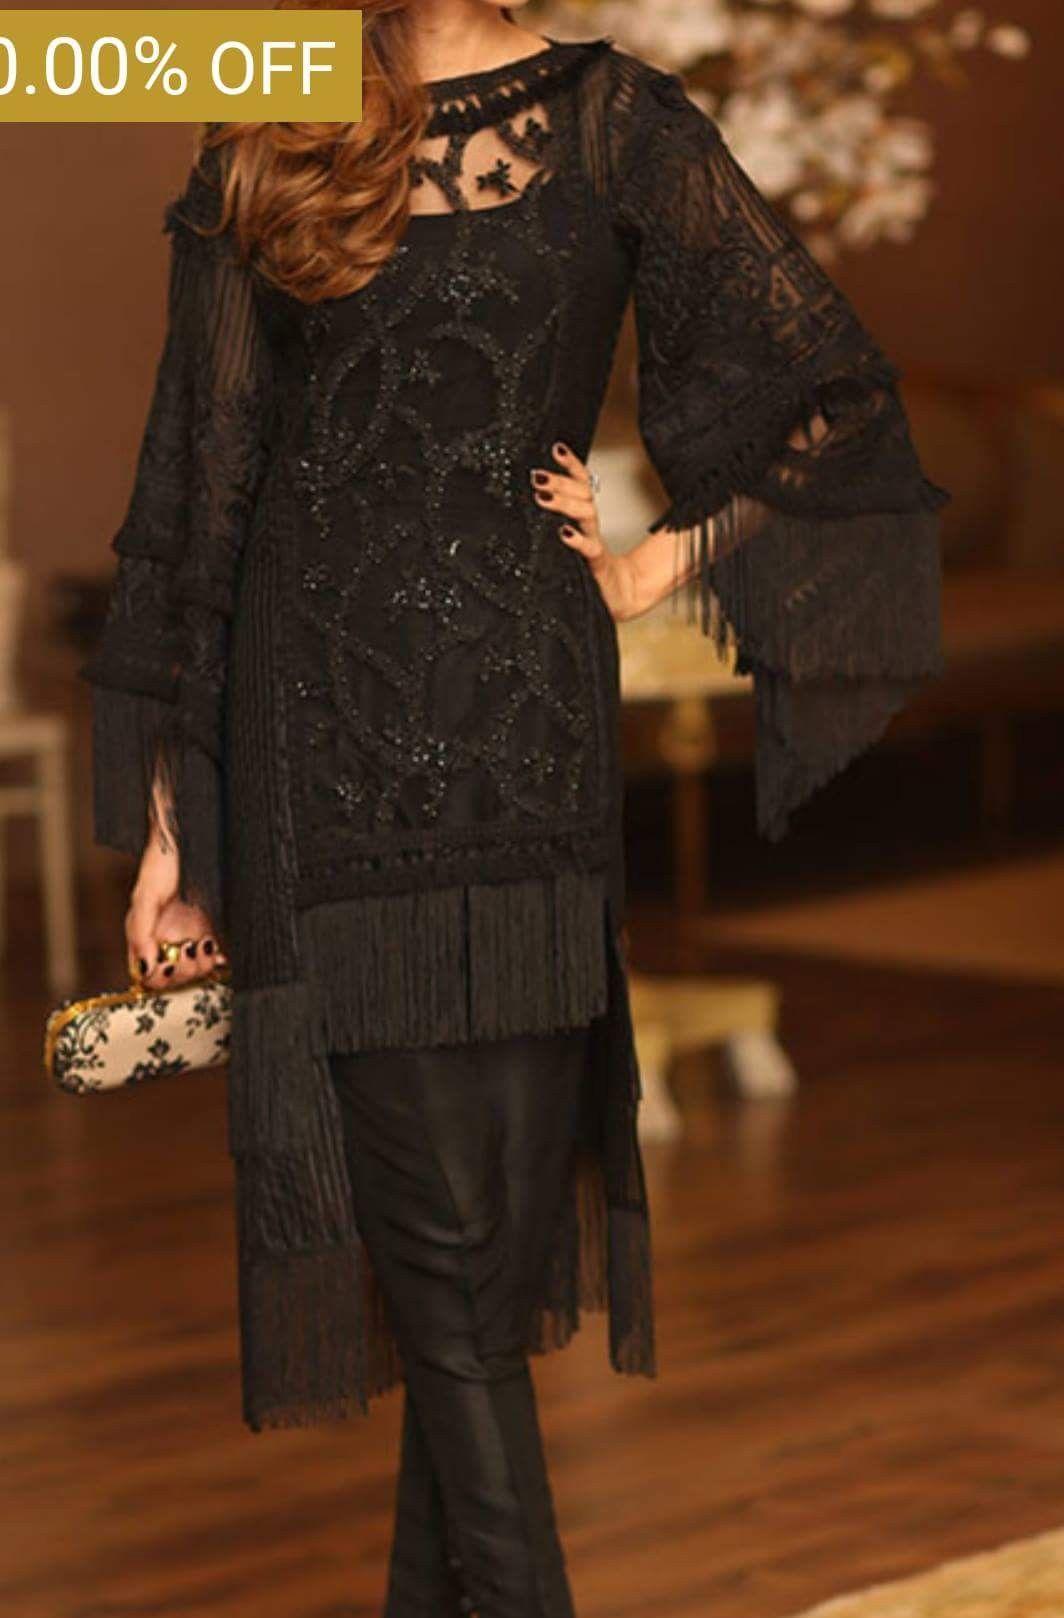 Pin By Shibra Mahanoor On My Wardrobe Black Bridal Dresses Designer Dresses Indian Pakistani Wedding Outfits